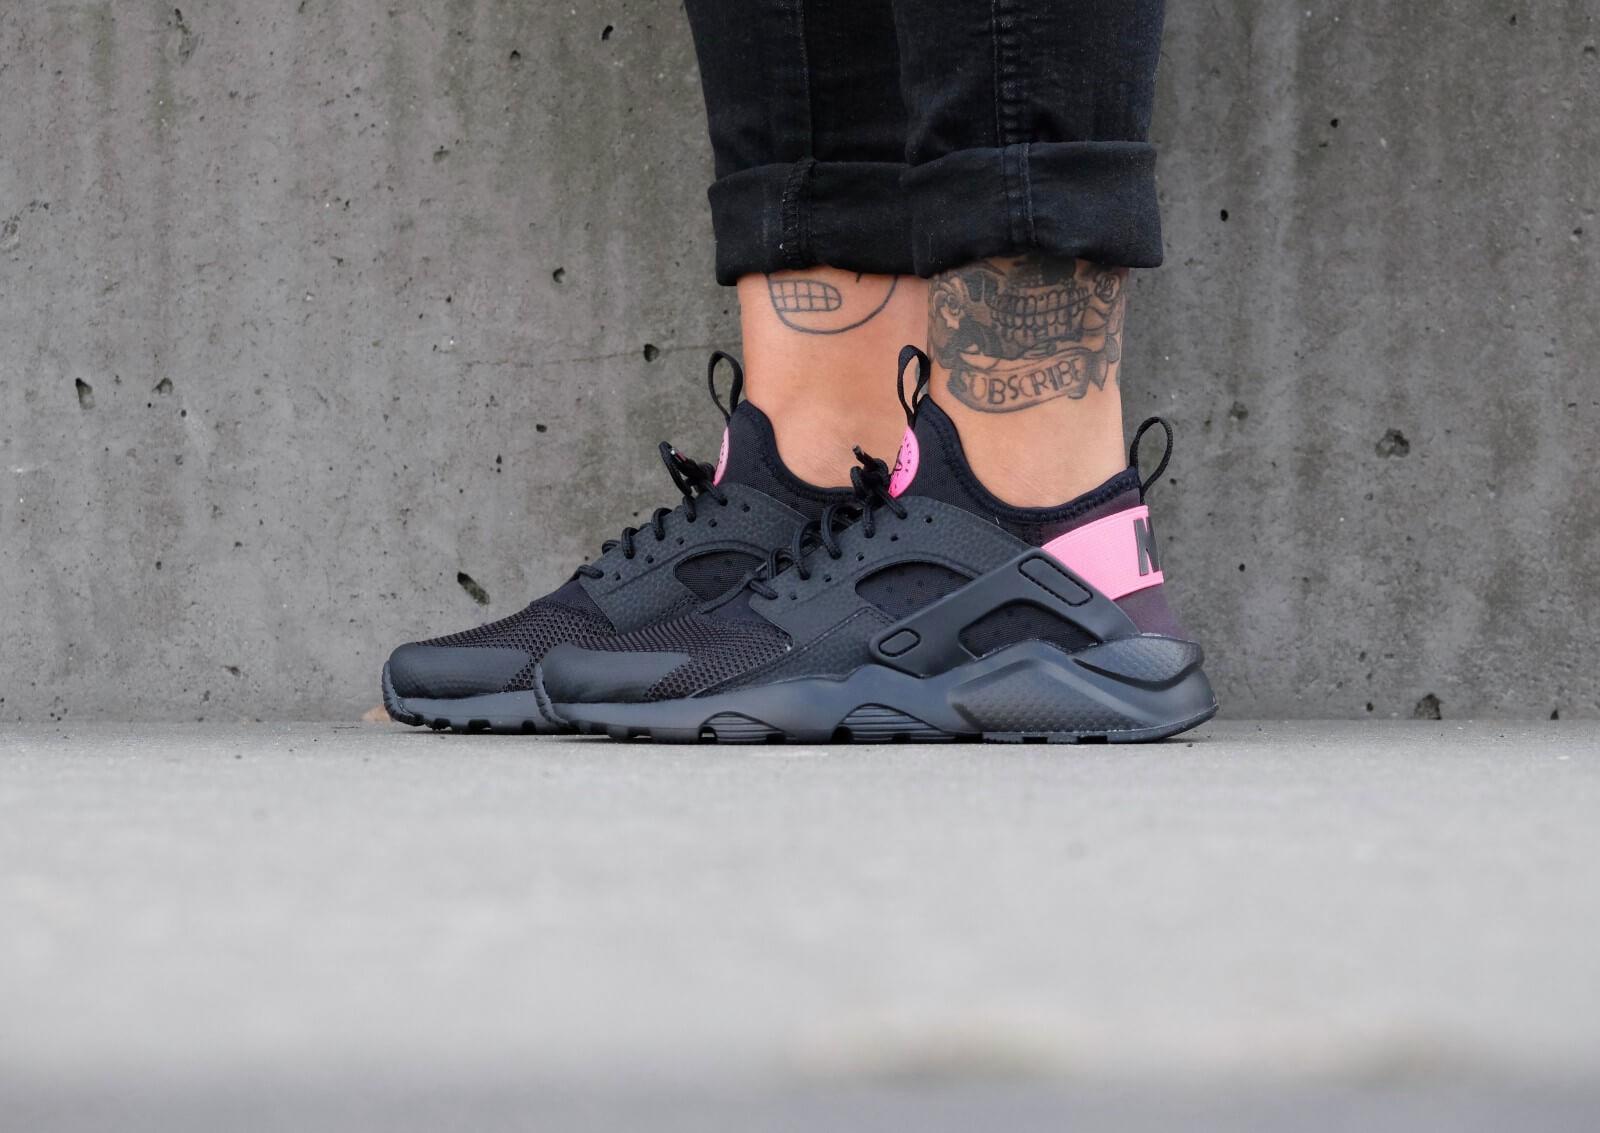 Nike Air Huarache Ultra GS Black Black Hyper Pink 847568 003